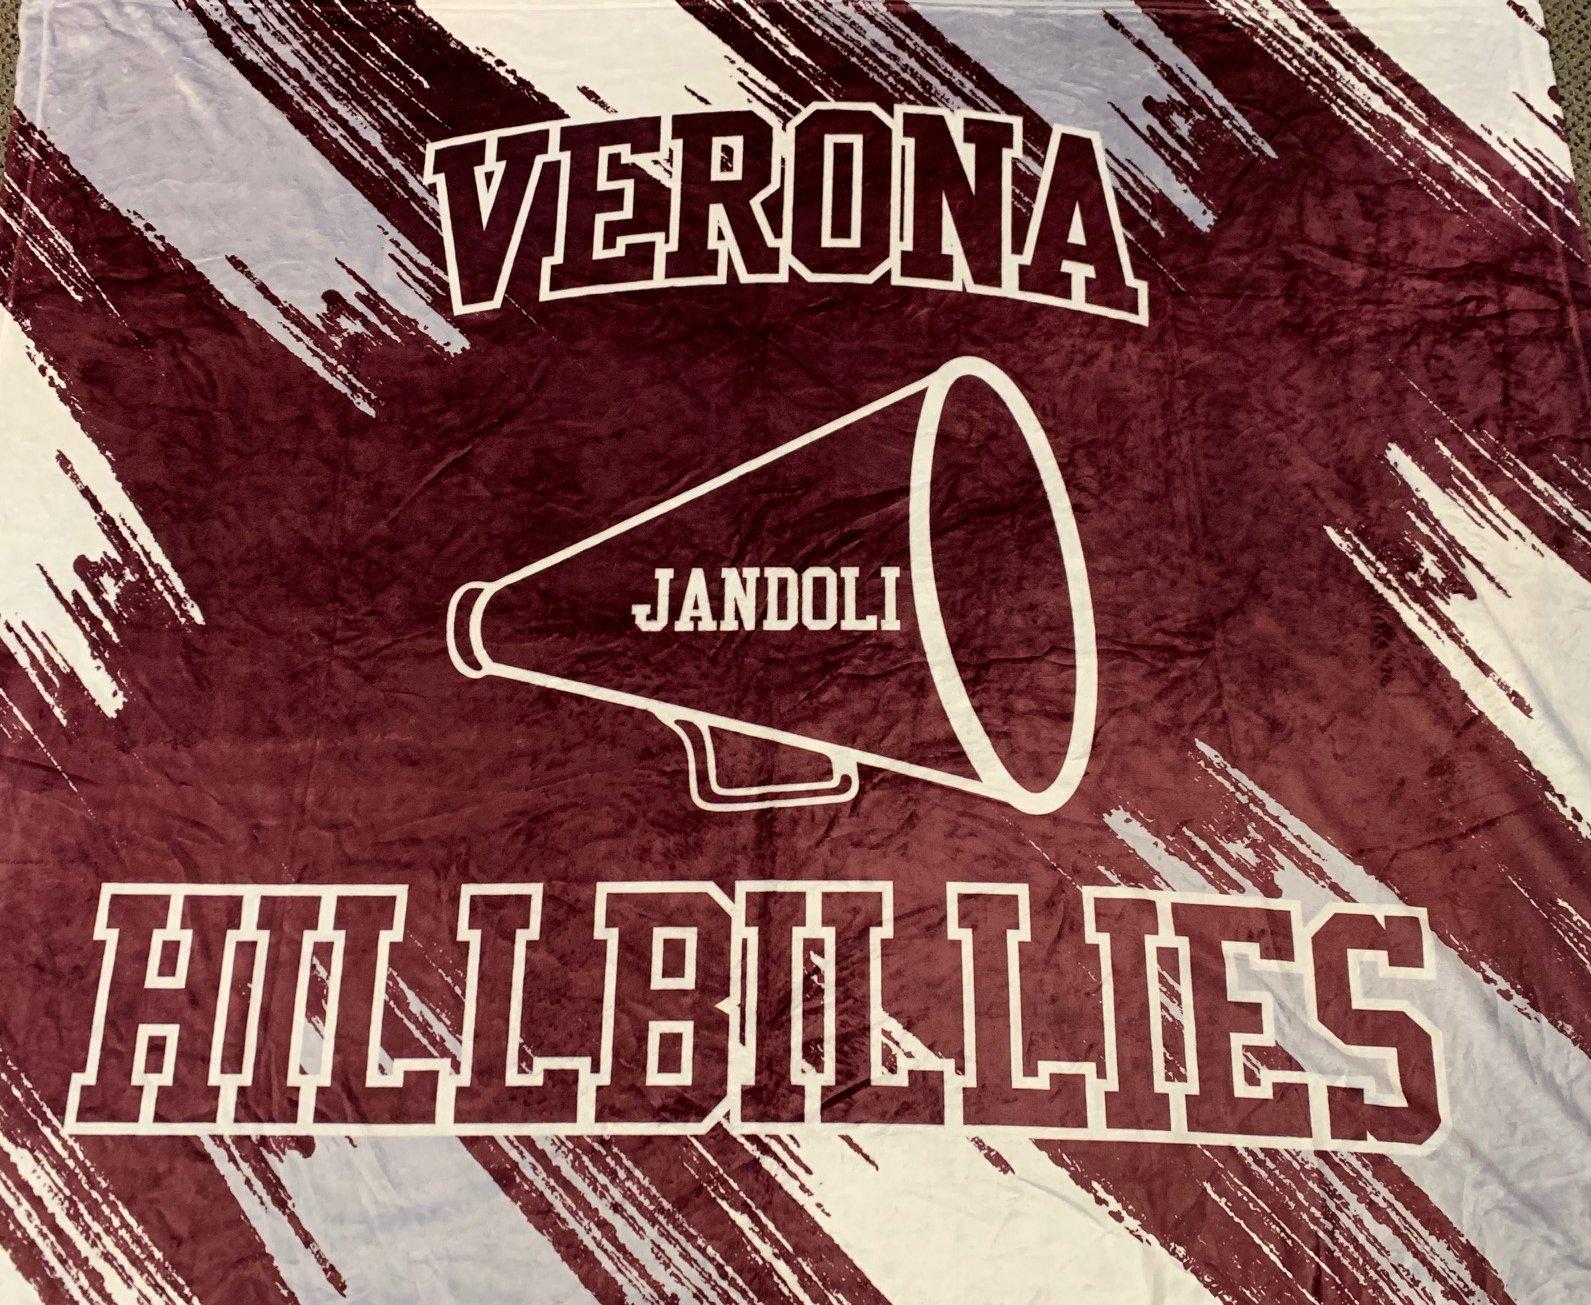 Sublimated Verona Cheer Blanket